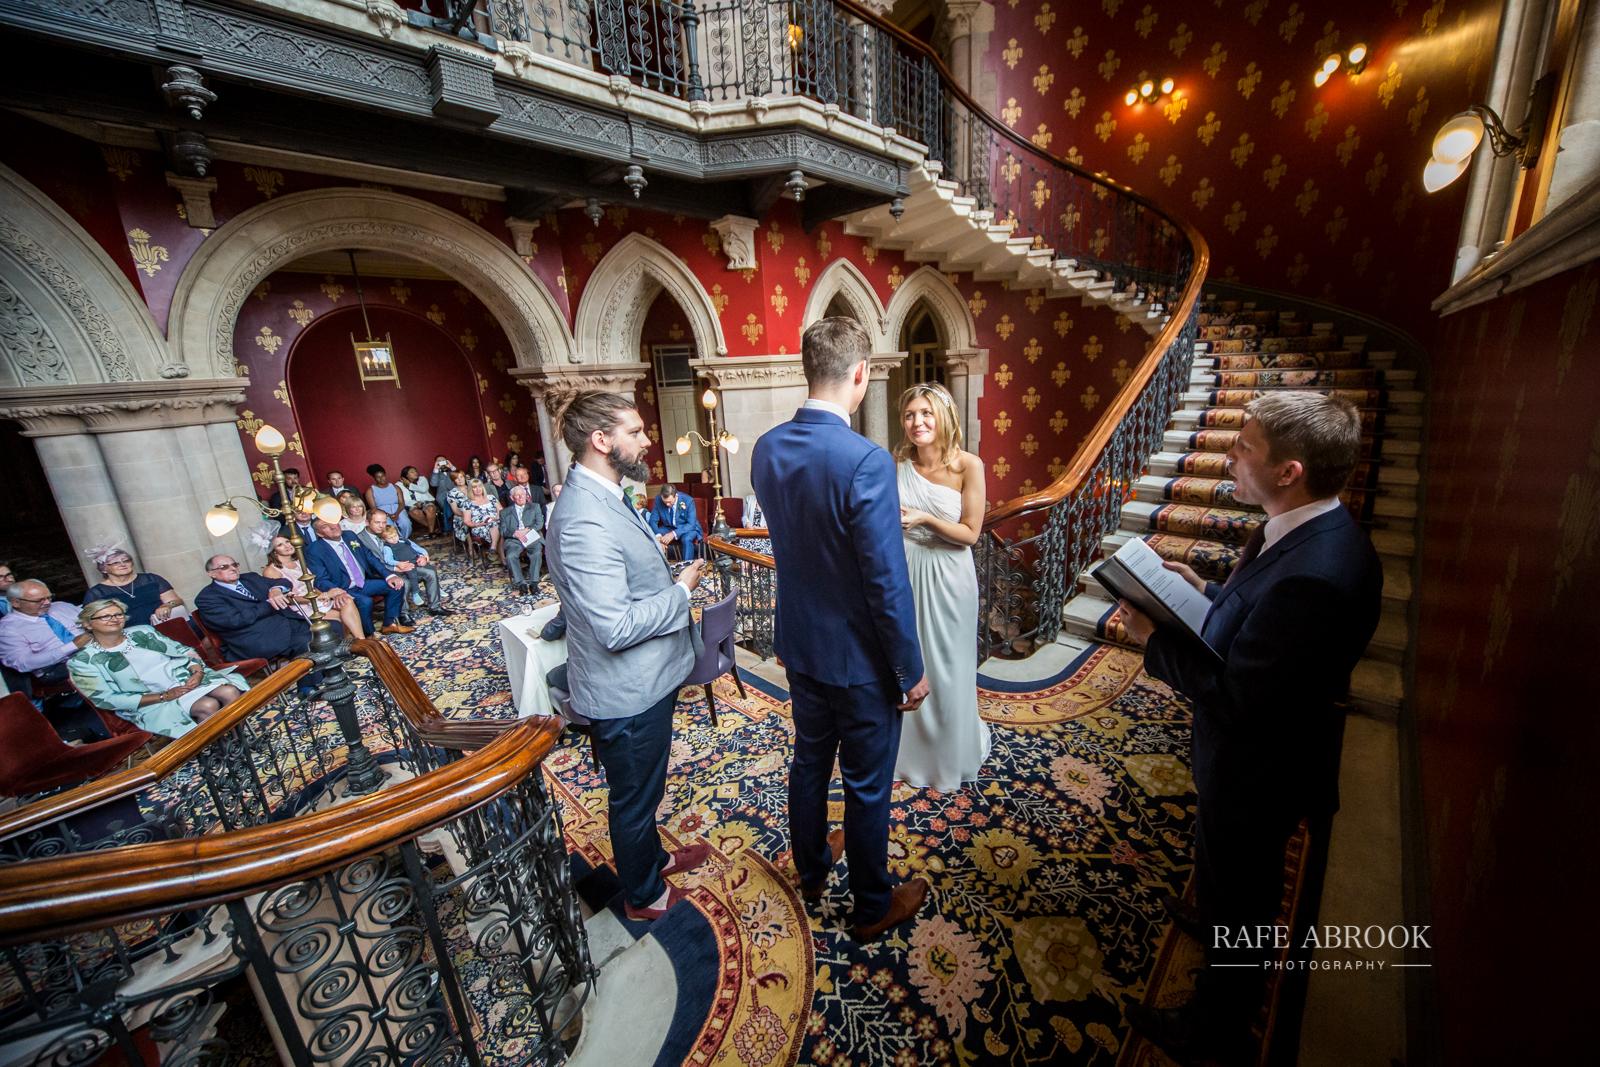 wedding photographer hertfordshire london st pancras renaissance hotel station grand staircase-1087.jpg